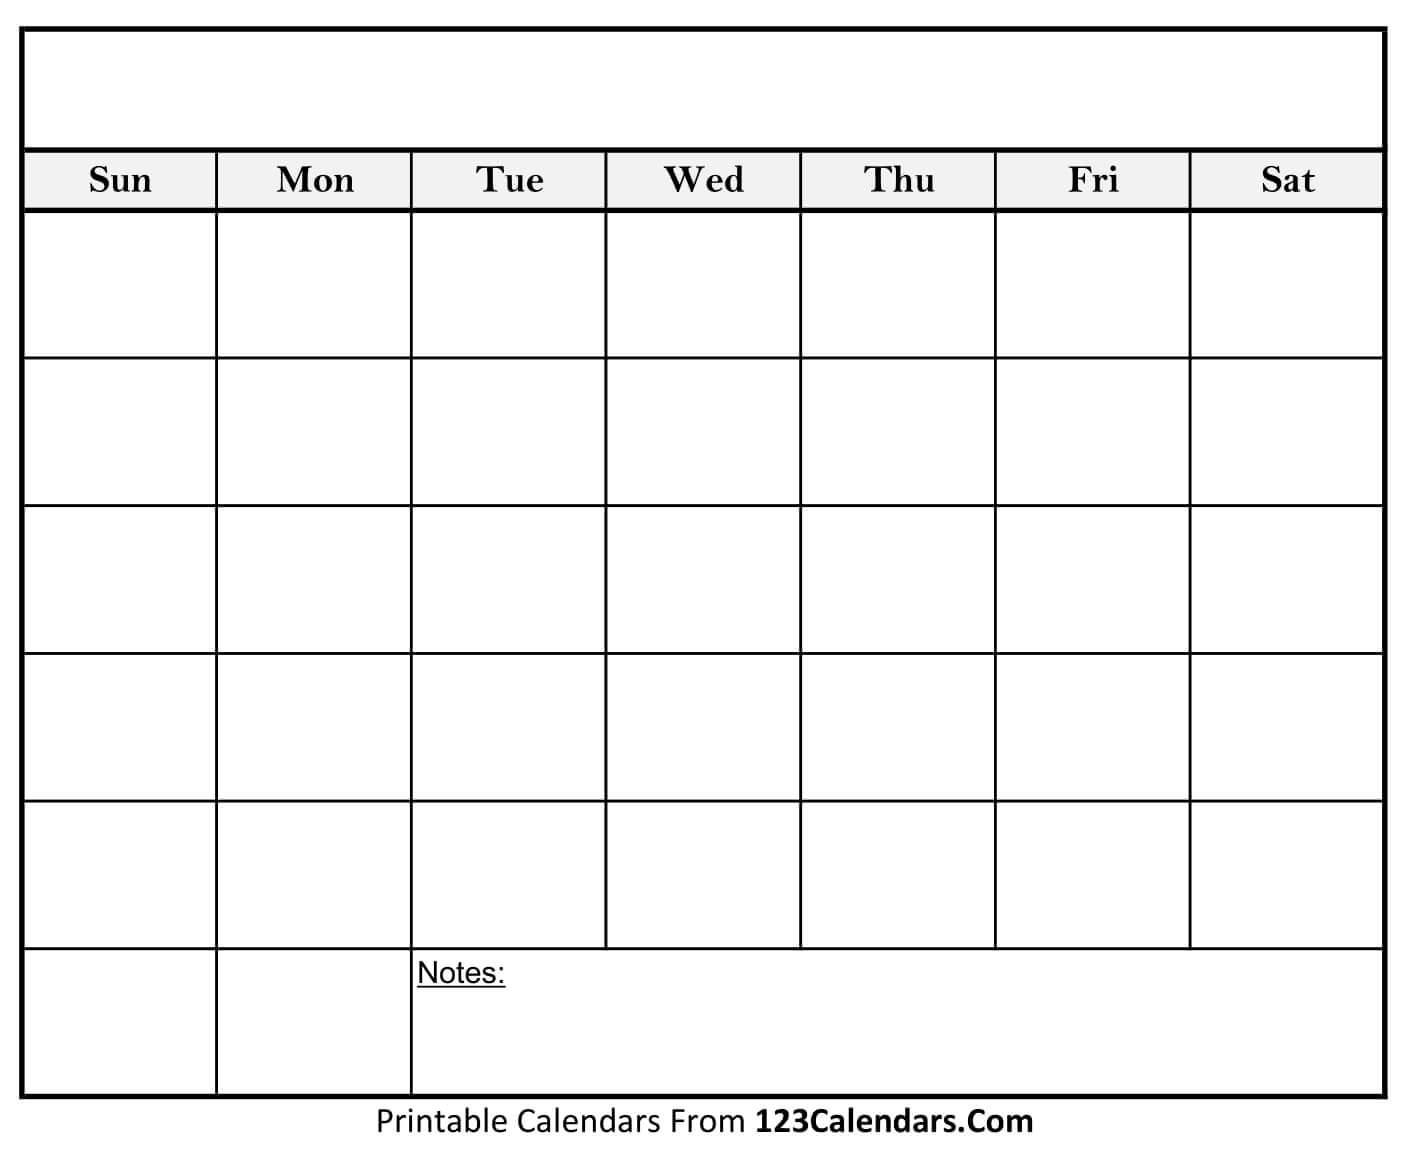 Free Printable Blank Calendar | 123Calendars  Full Page Blank Calendar Printable